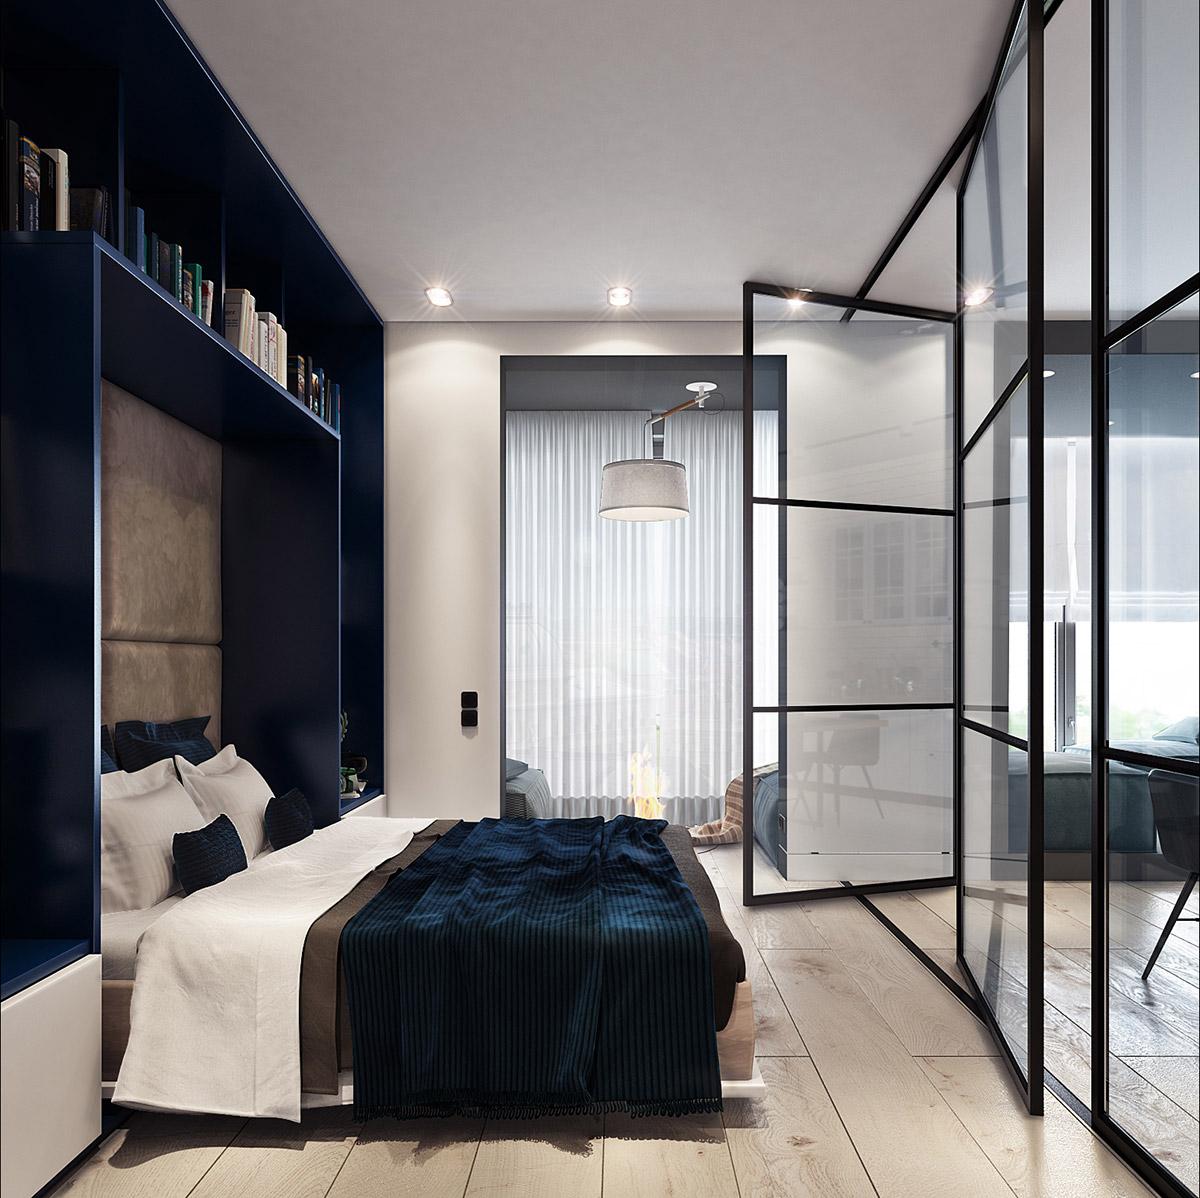 Синий оазис минимализма: фото-тур по двум компактным и стильным квартирам